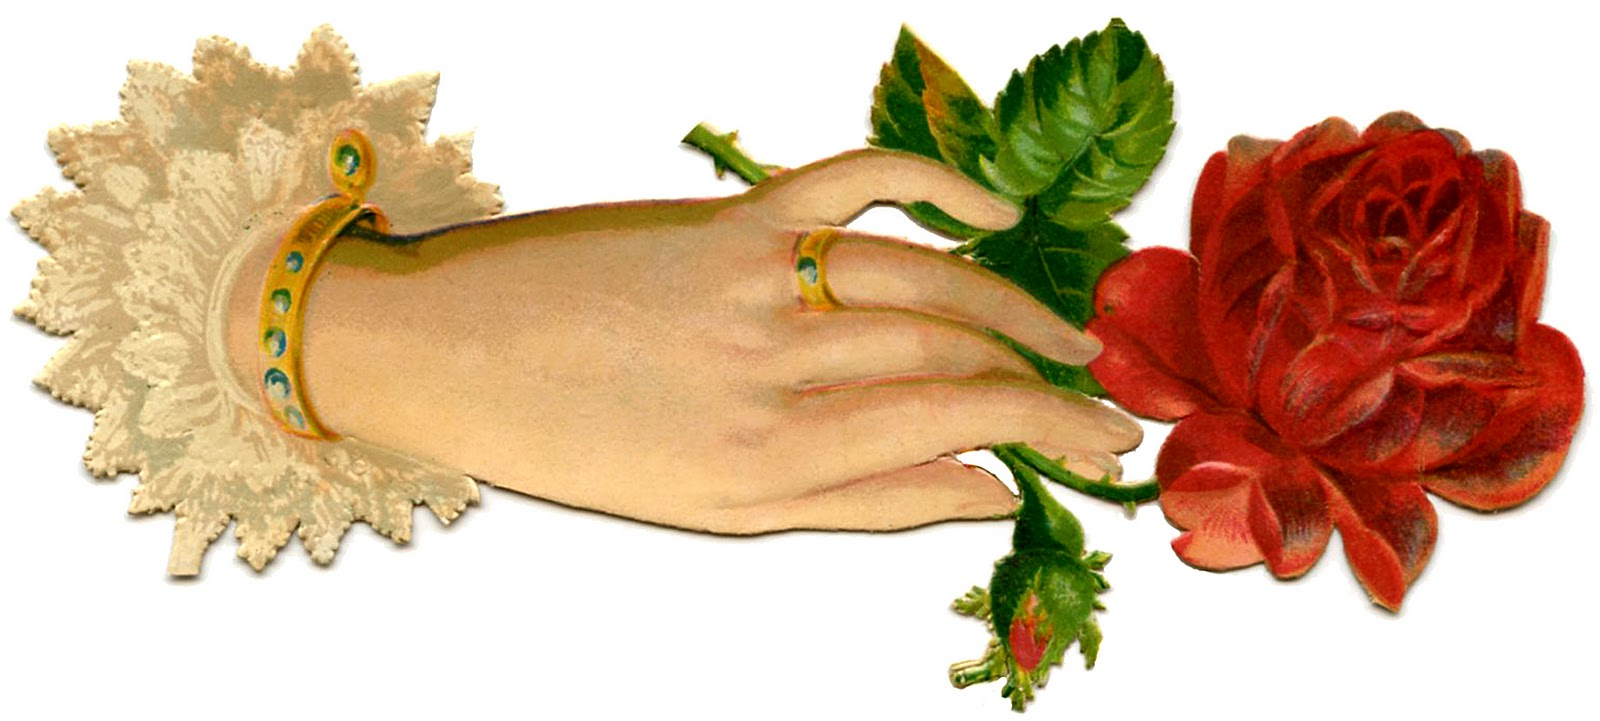 http://2.bp.blogspot.com/-FclgK66sUUs/TwjoDRRjKBI/AAAAAAAAQH4/_NfVaYE22rk/s1600/hand+with+rose+vintage+Image+GraphicsFairy11b.jpg